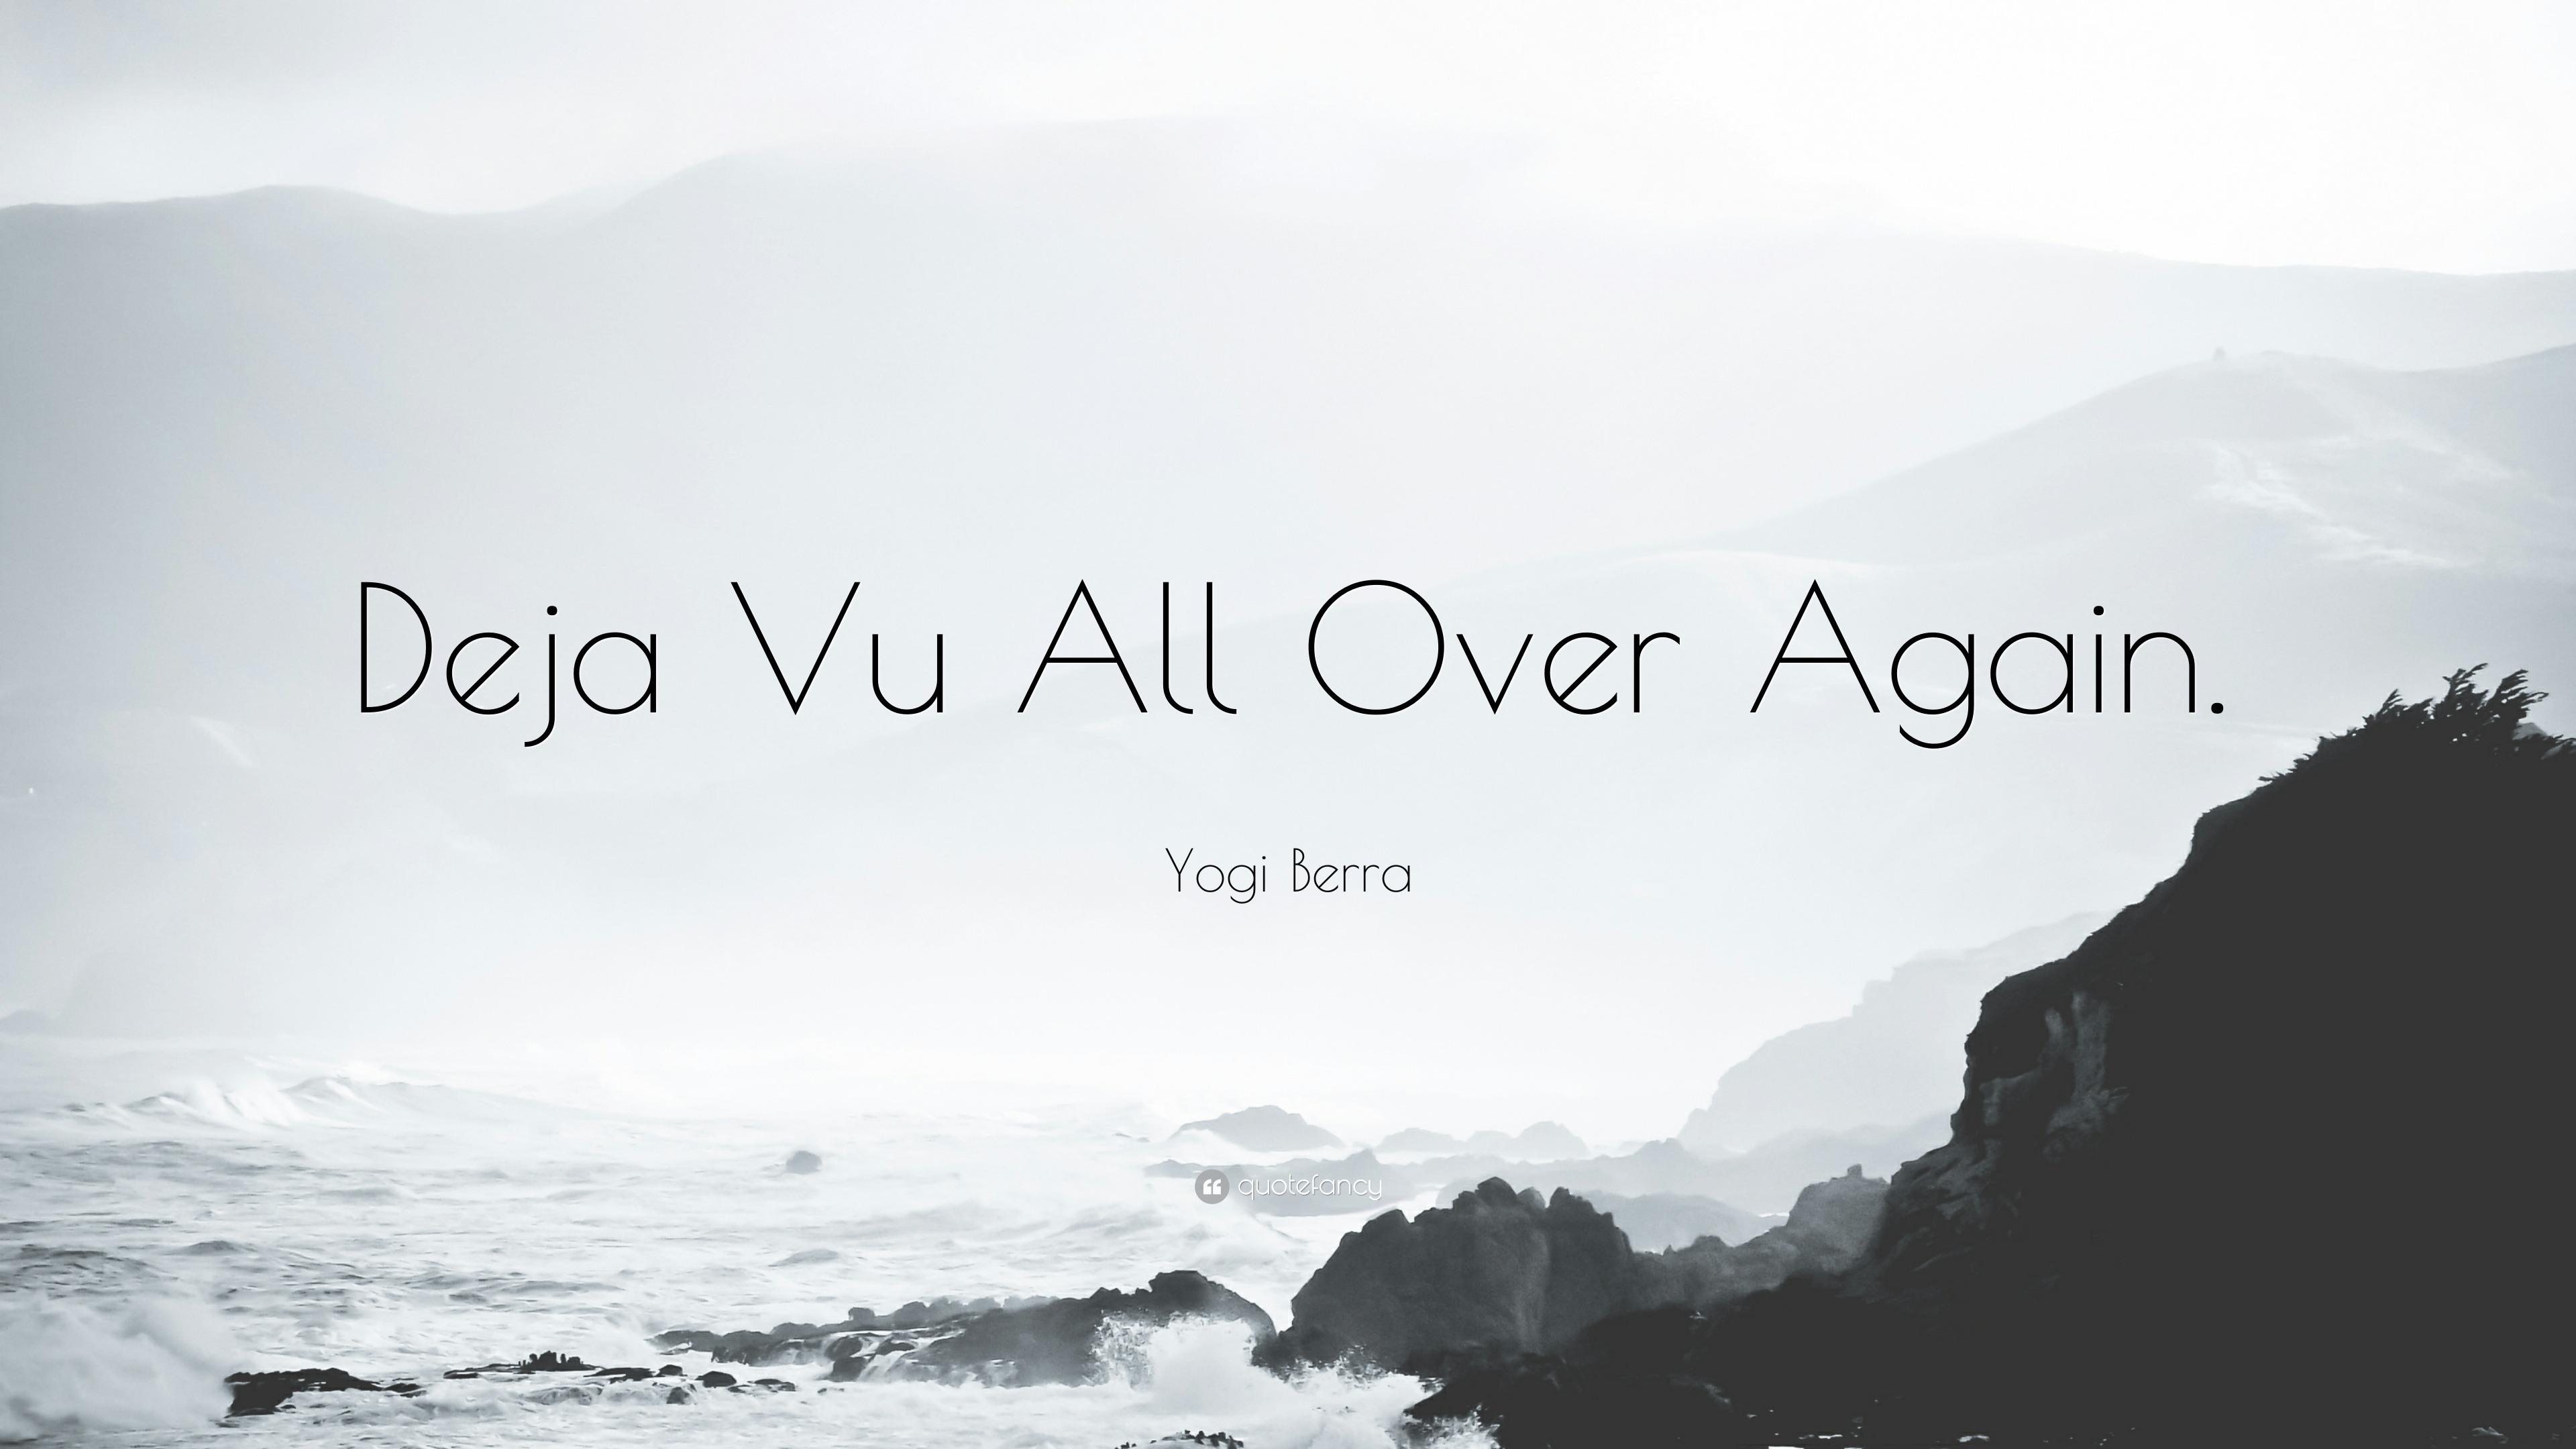 Deja Vu All Over Again >> Yogi Berra Quote Deja Vu All Over Again 7 Wallpapers Quotefancy